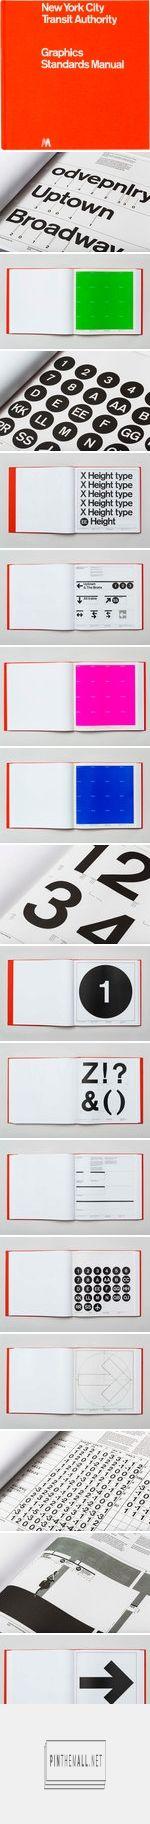 NYCTA Graphics Standards Manual reissues https://standardsmanual.com/